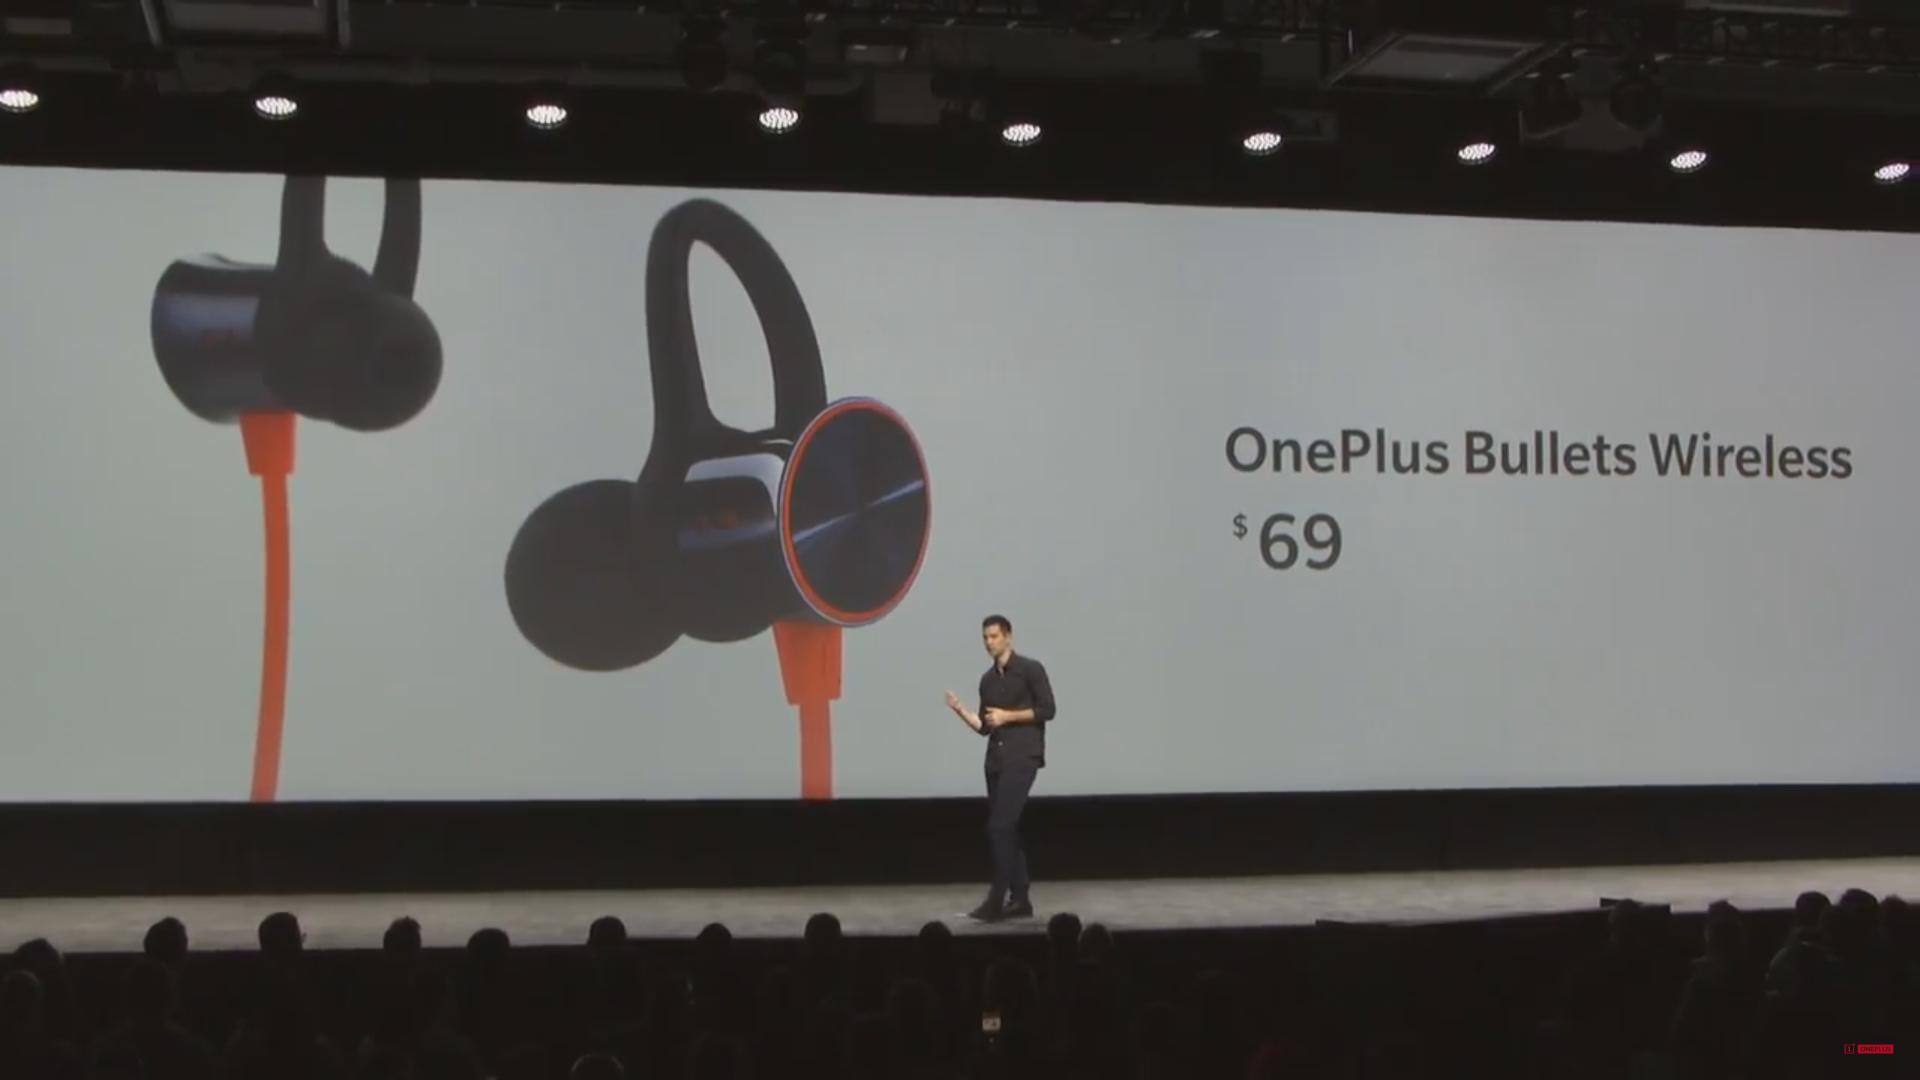 Oneplus تزيح الستار عن Oneplus 6T وبعض الاكسسوارات الجديدة 27